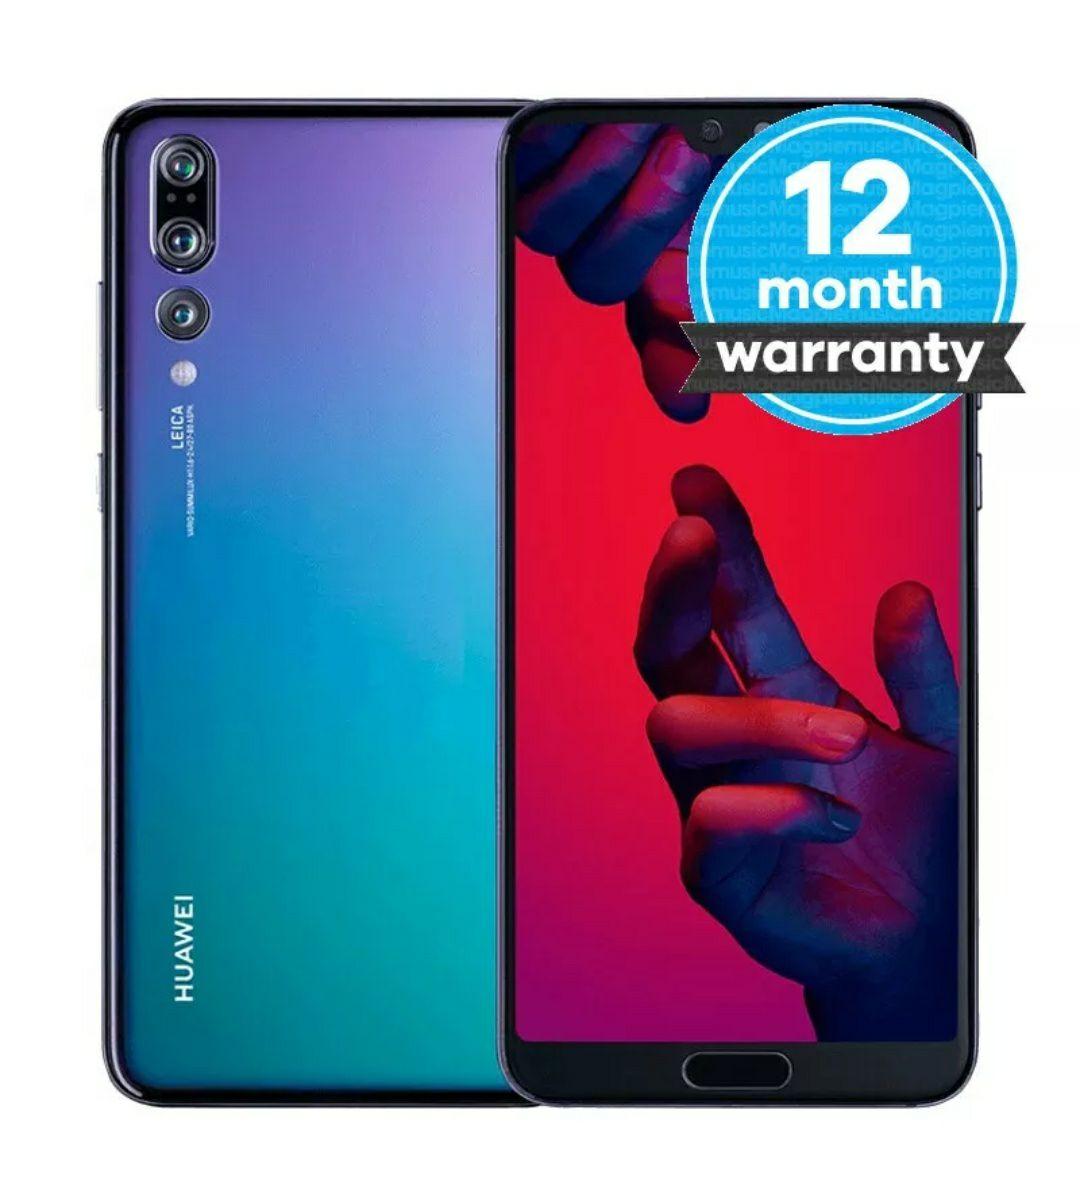 Huawei P20 Pro 128GB Twilight Vodafone Good Condition Smartphone - £170.99 @ Music Magpie / Ebay